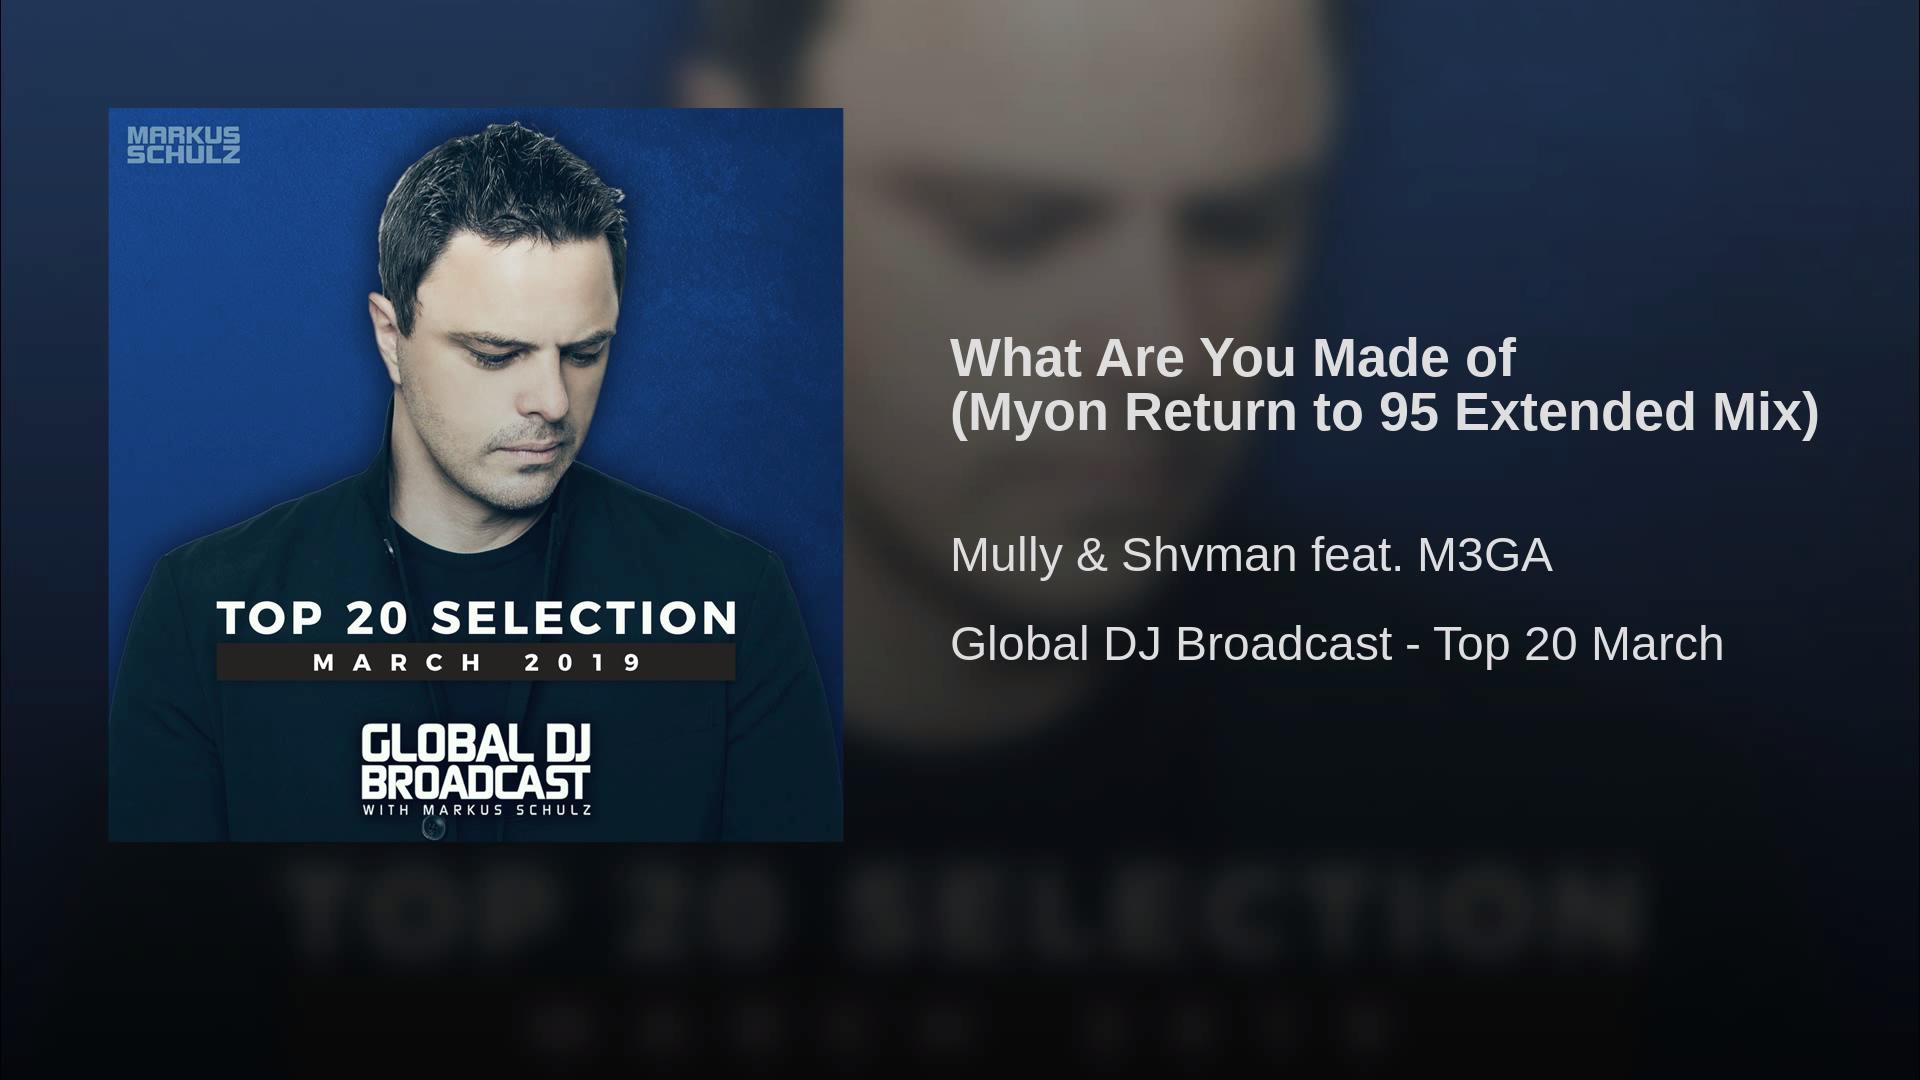 Markus Schulz - Global DJ Broadcast Top 20.png